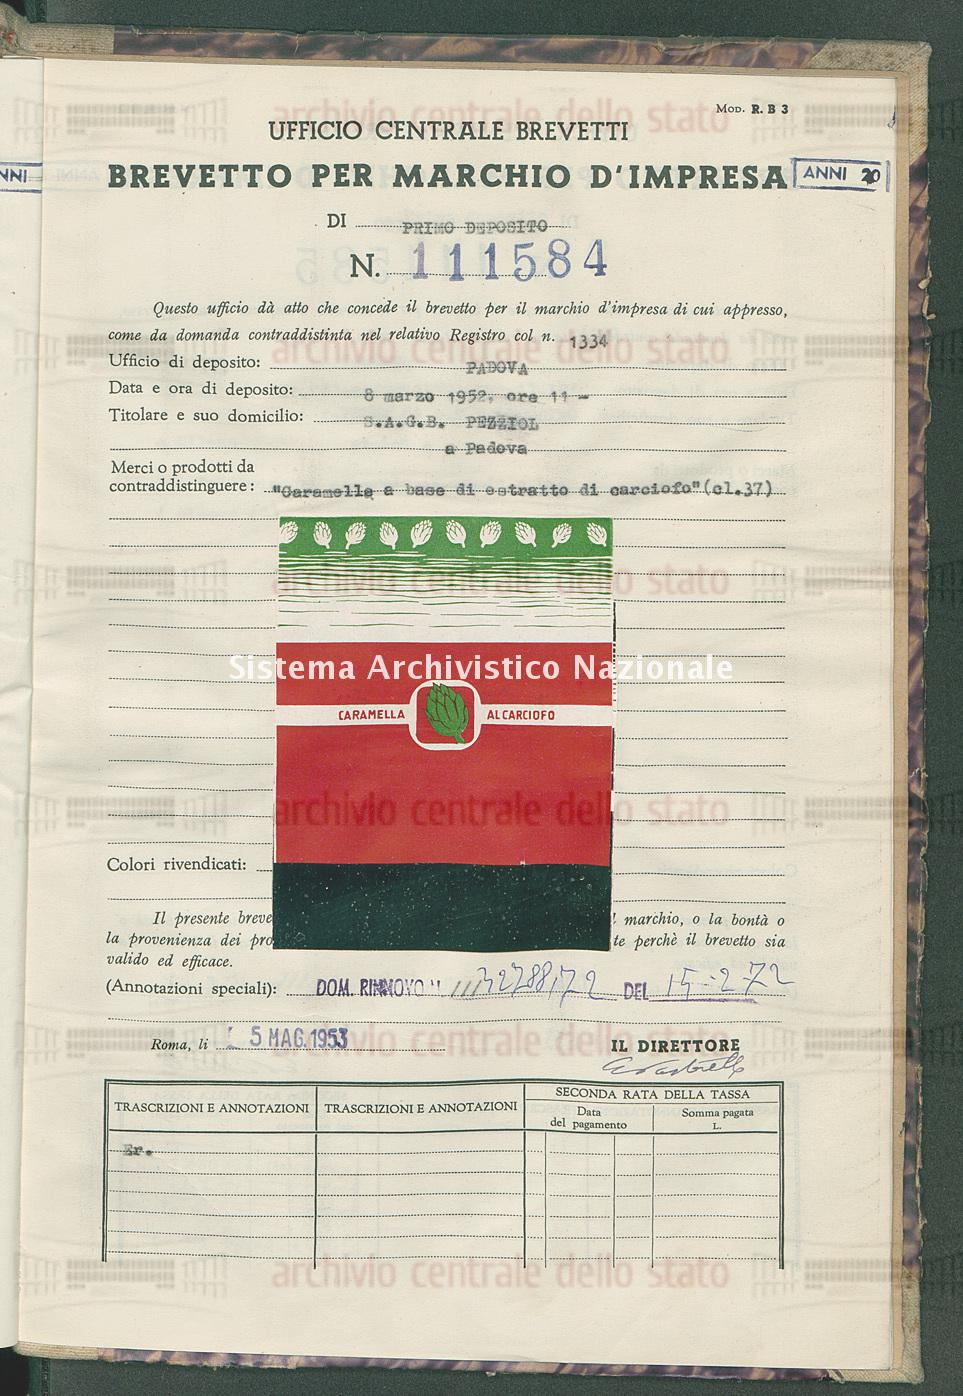 'Caramelle a base di estratto di carciofo' S.A.G.B.Pezziol (05/05/1953)